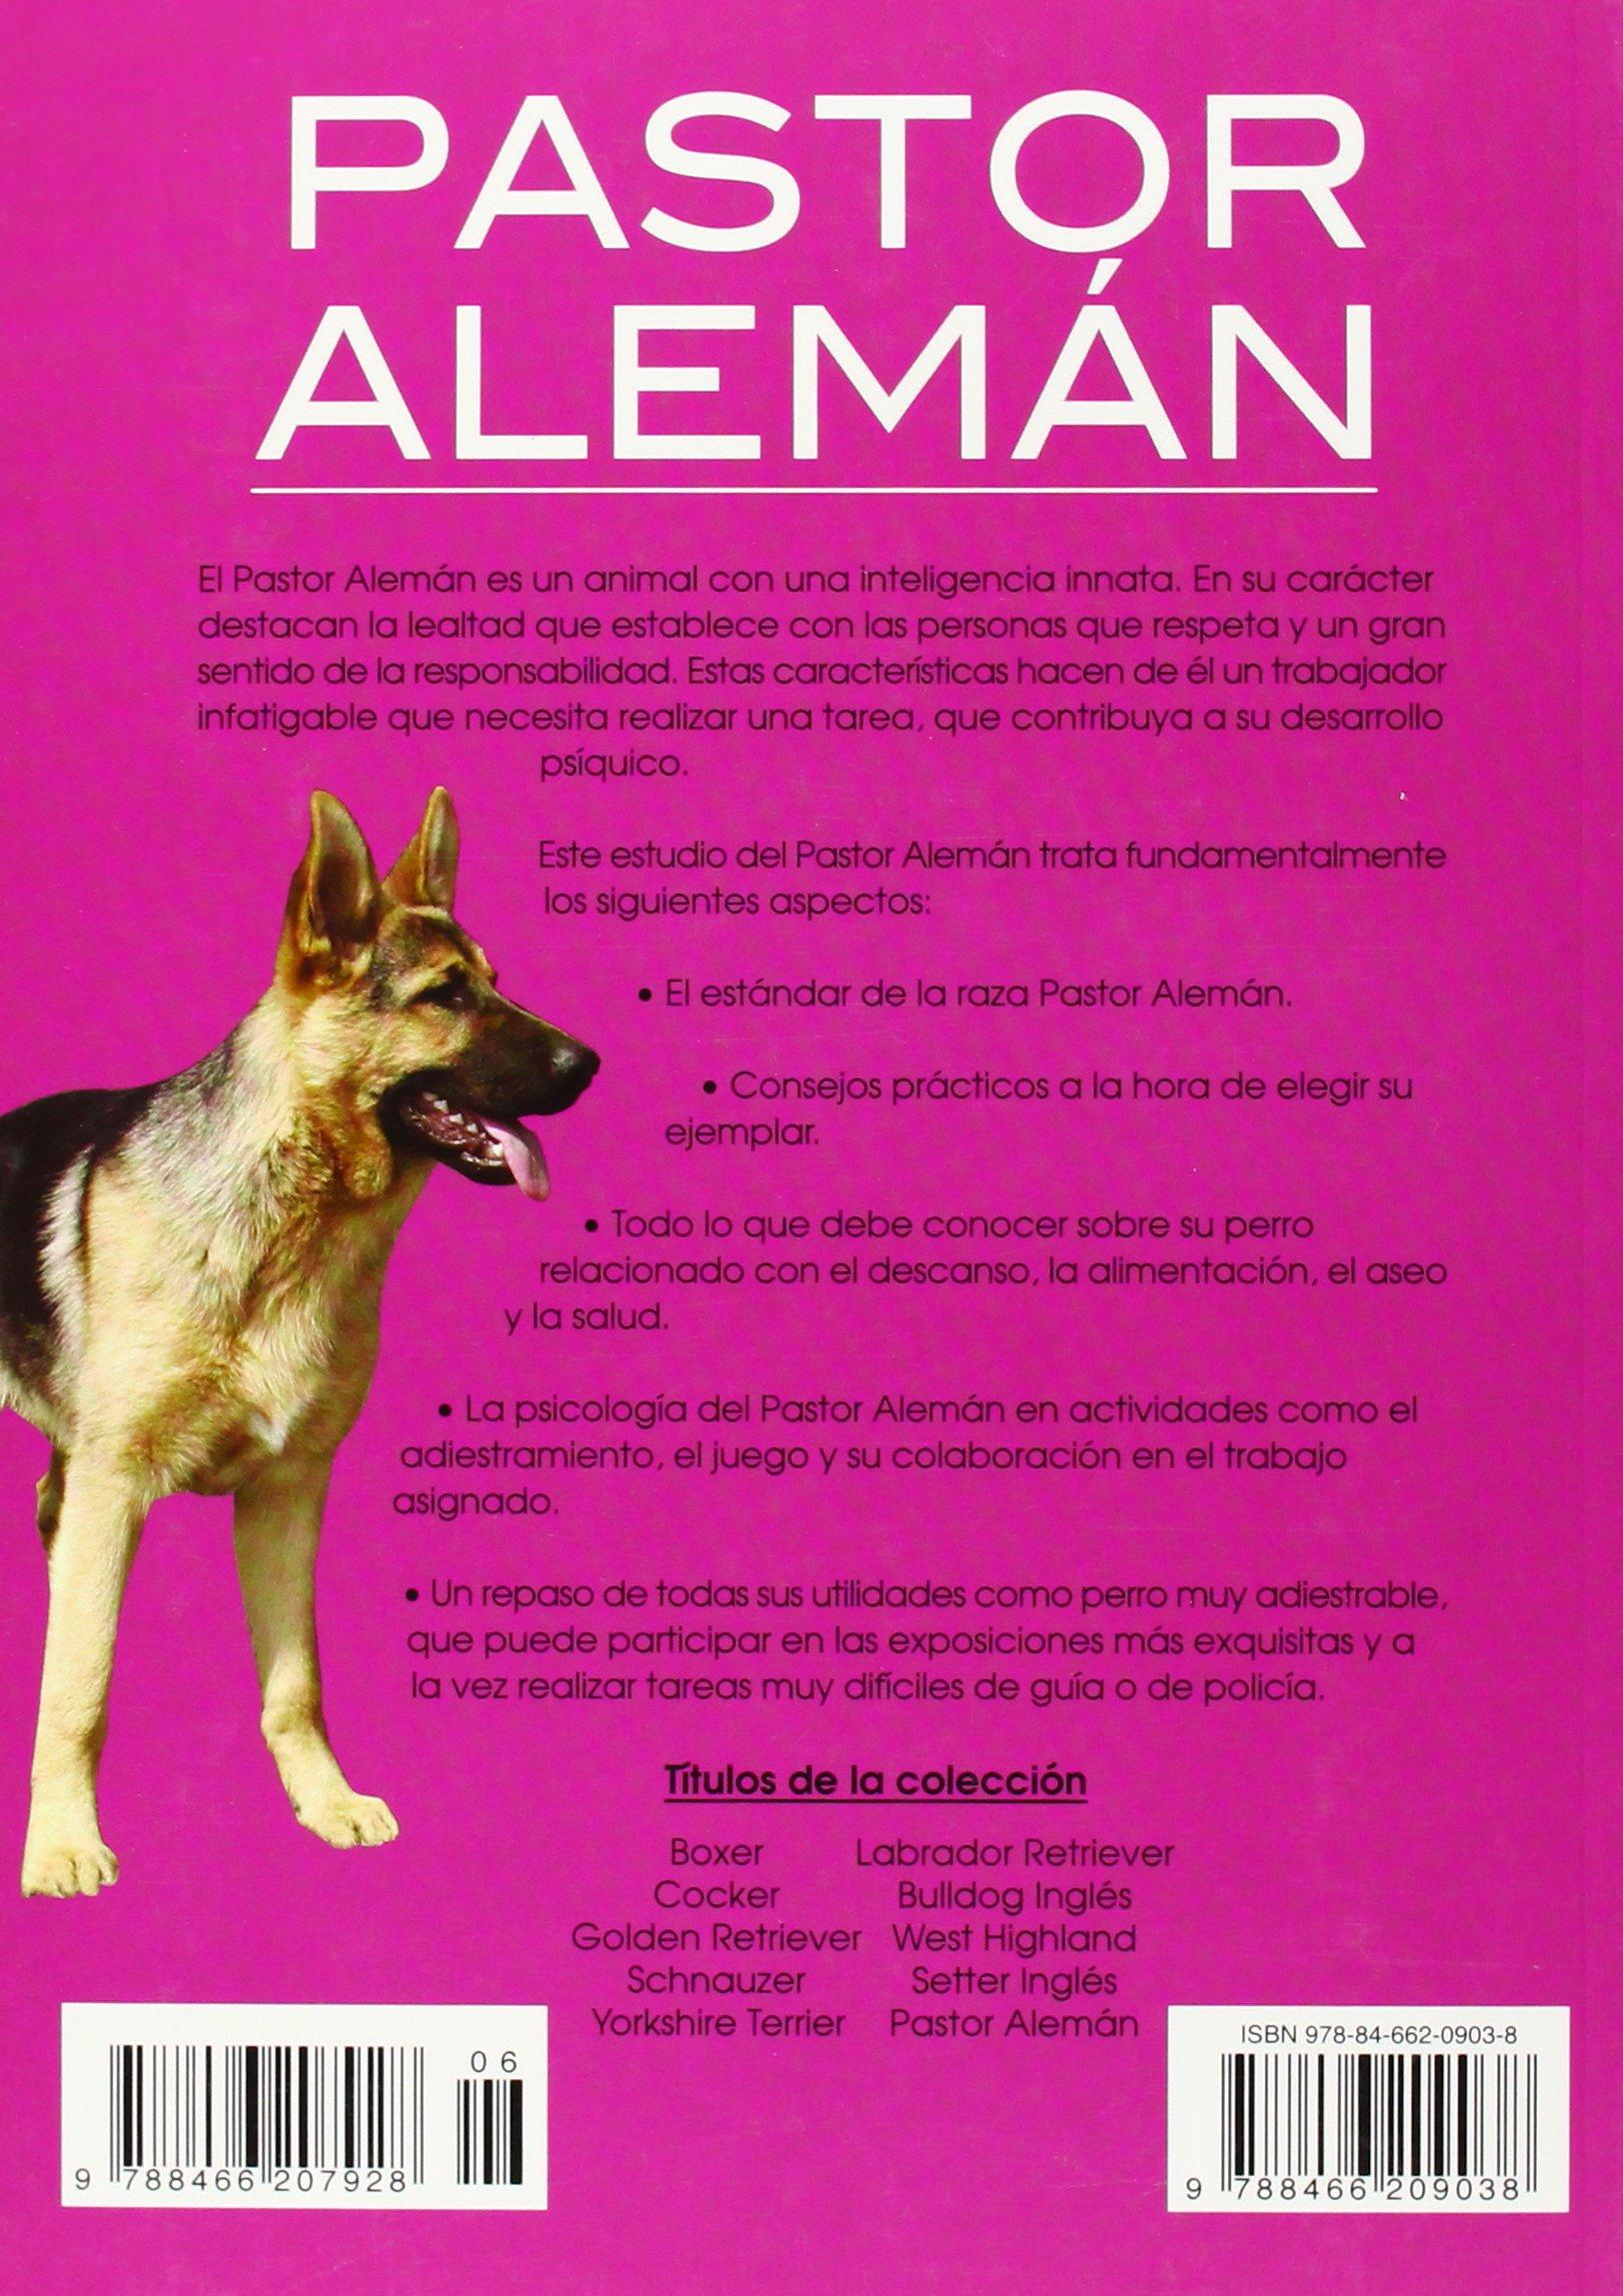 Pastor aleman / German Shepherd (Mi Mascota El Perro) (Spanish Edition): Javier Villahizan: 9788466209038: Amazon.com: Books